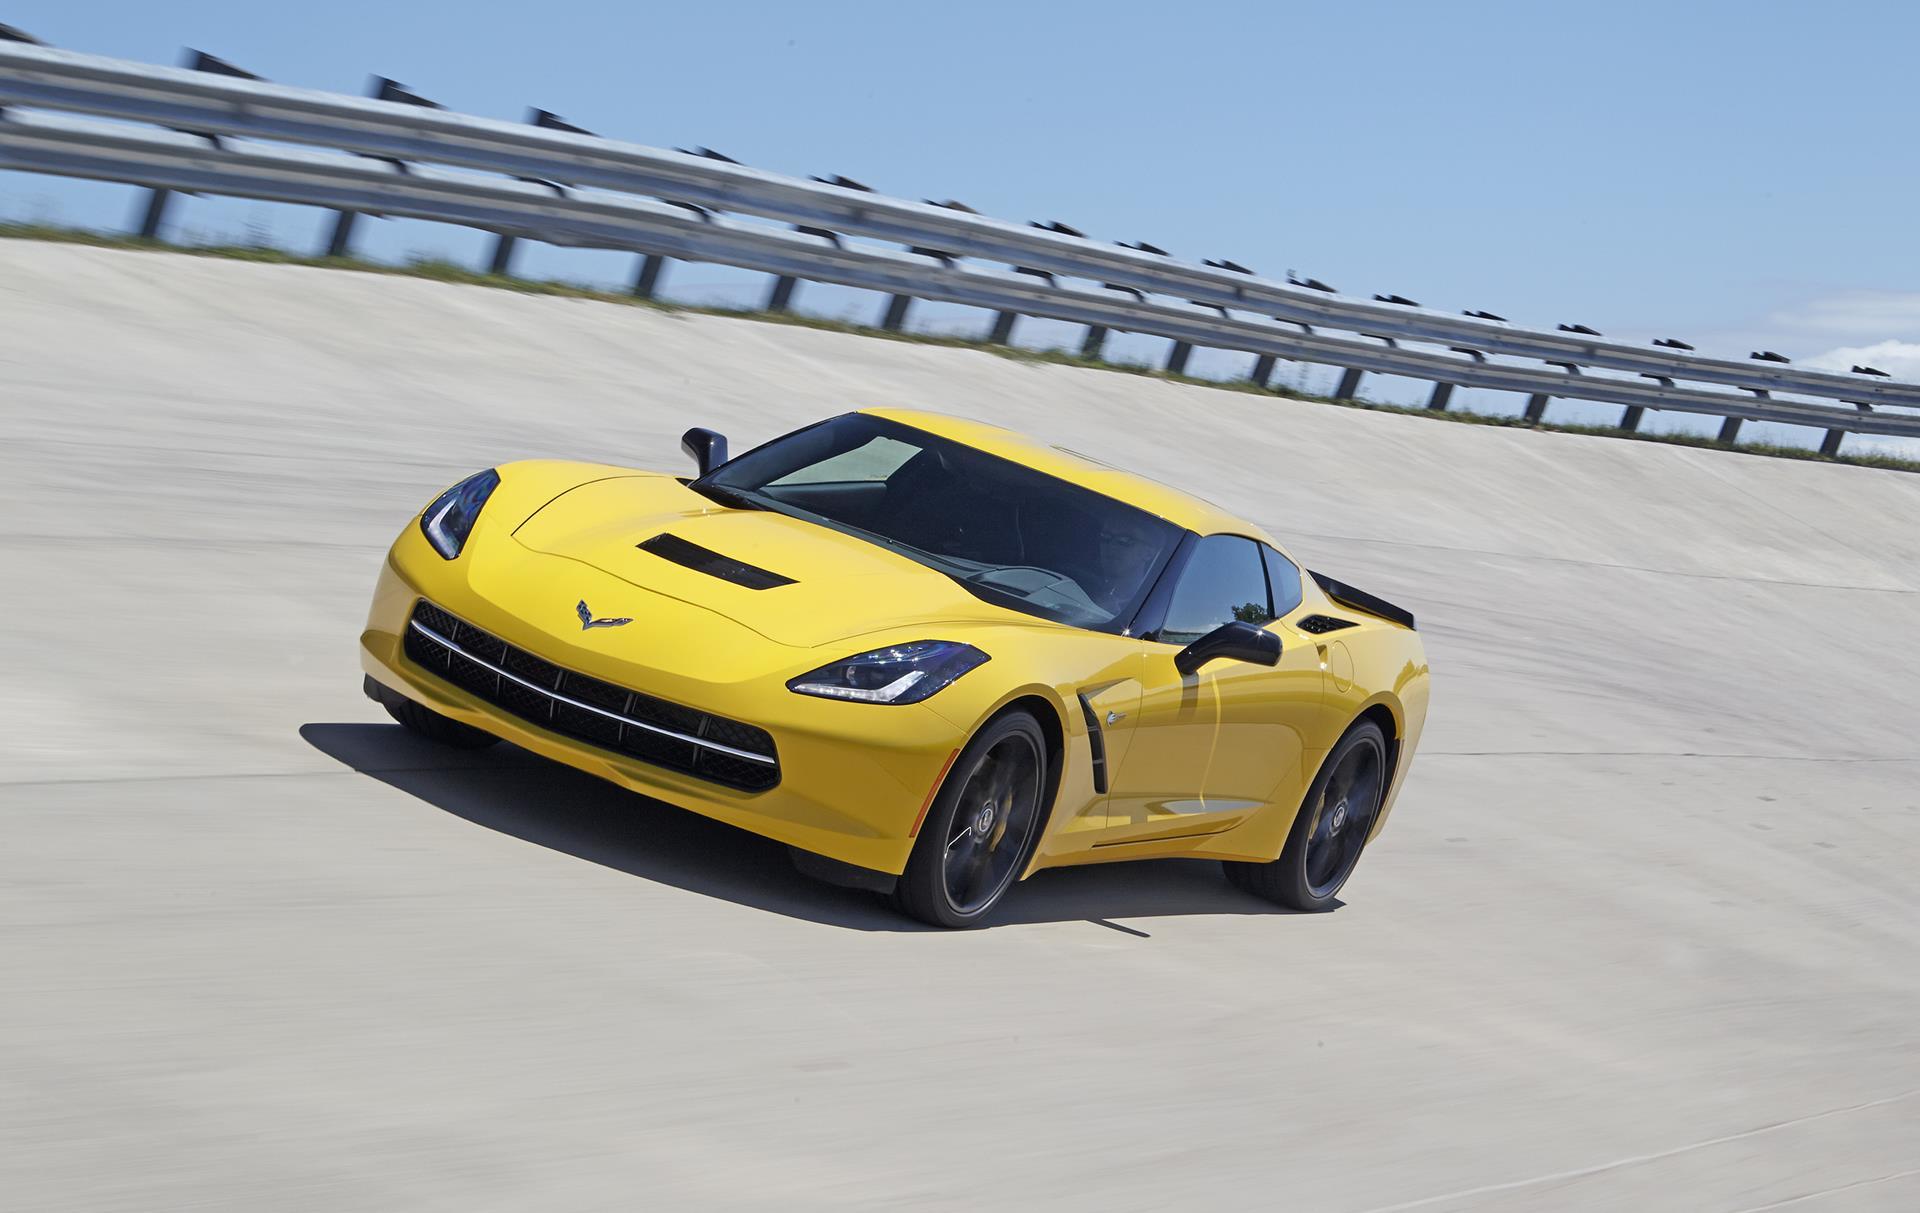 2016 Chevrolet Corvette News and Information